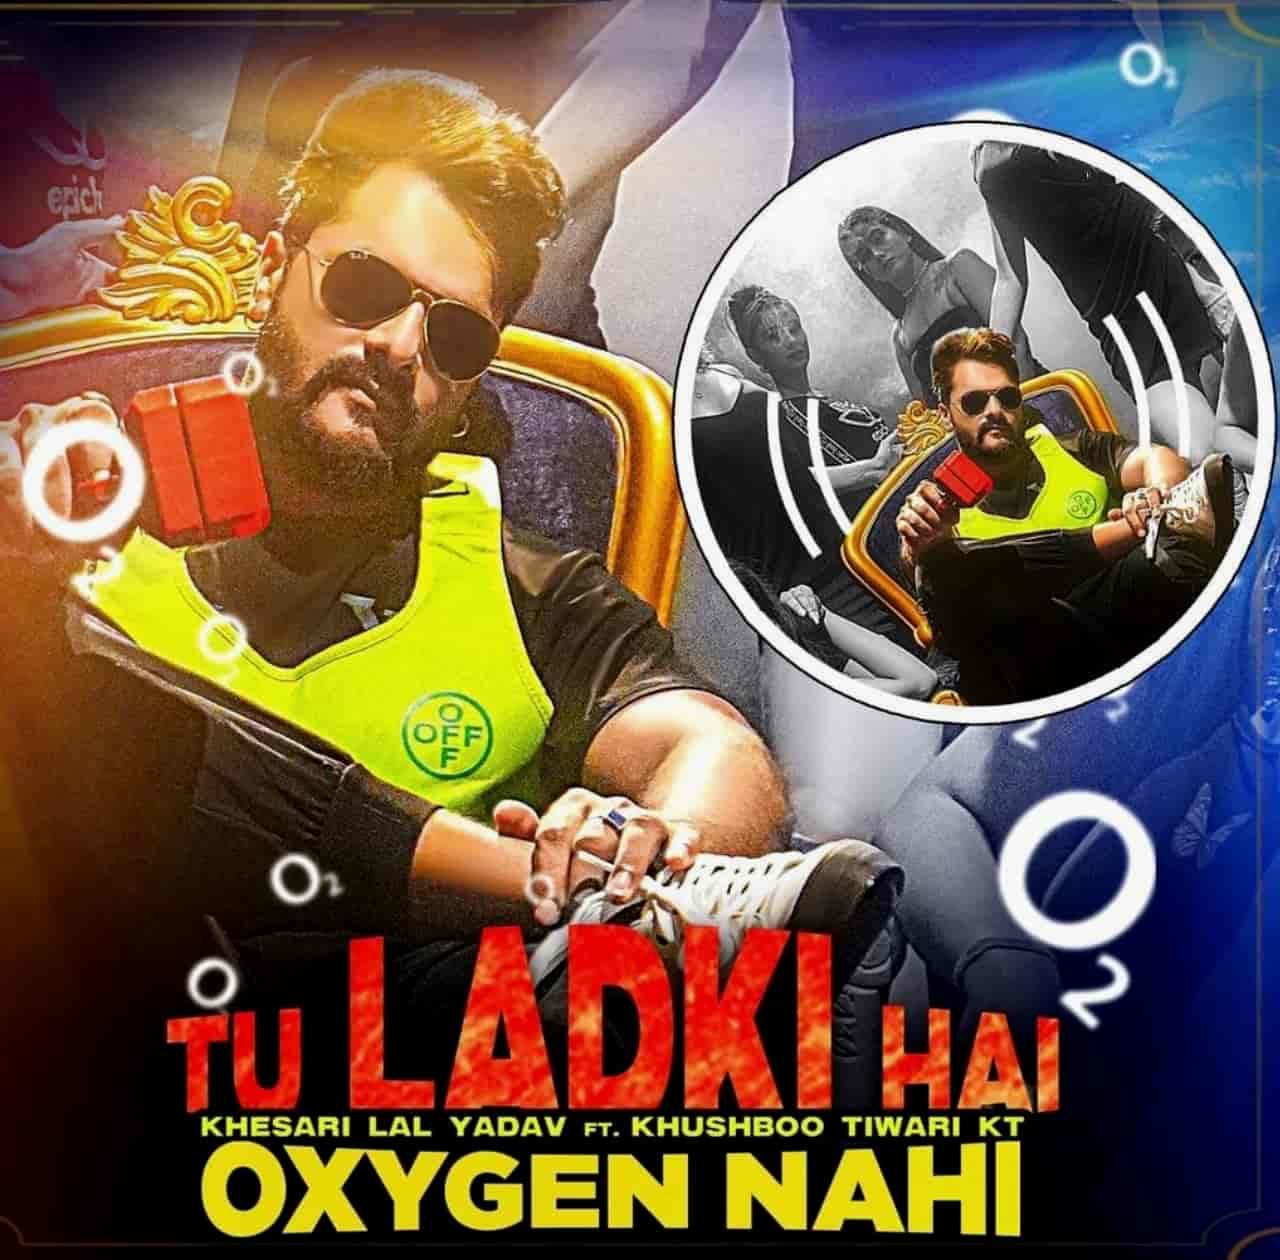 Tu Ladki Hai Oxygen Nahi Bhojpuri Song Image Features Khesari Lal Yadav